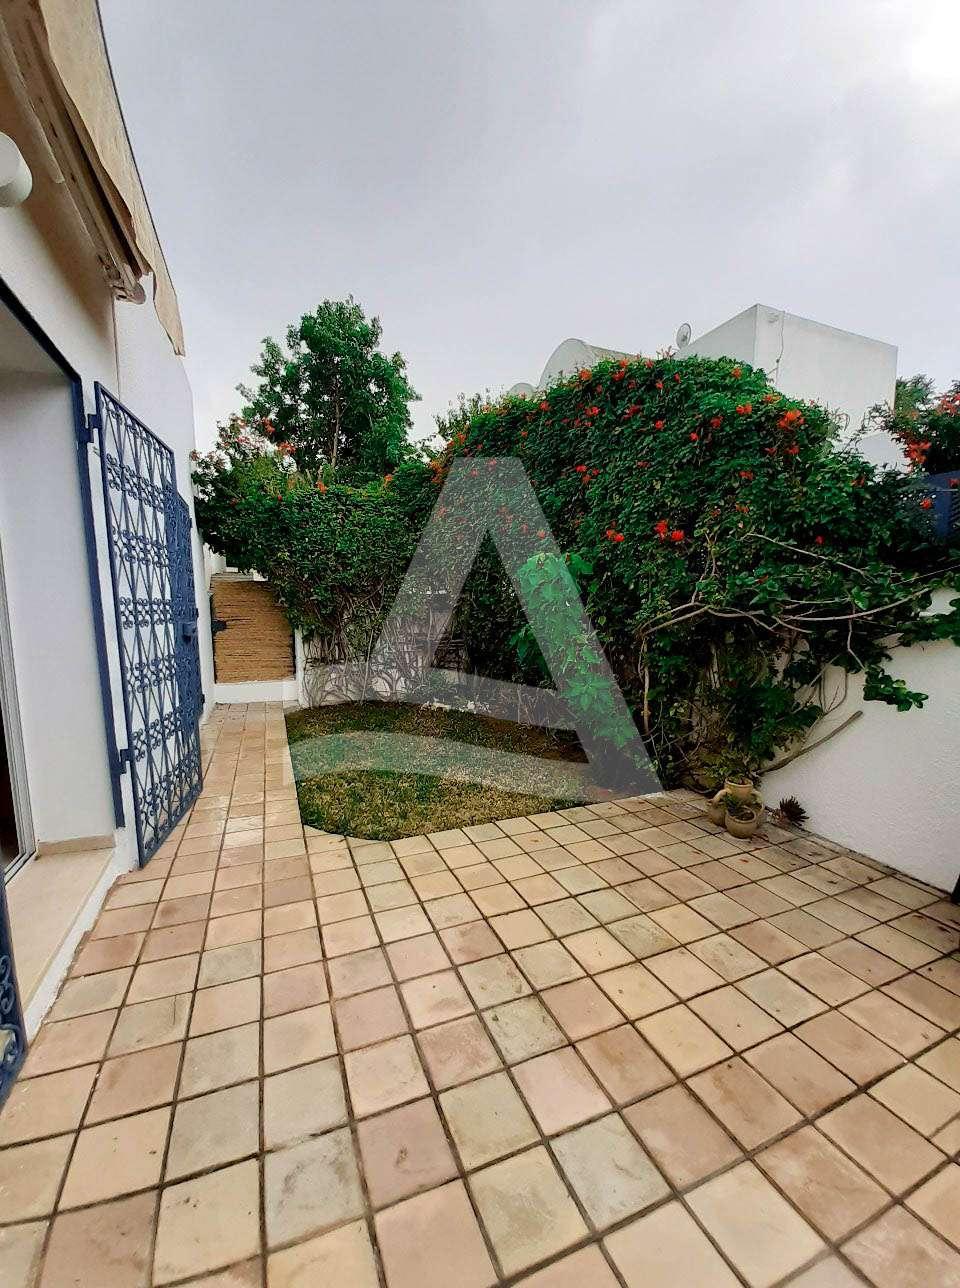 httpss3.amazonaws.comlogimoaws18483454811602854305Appartement_Marsa_Tunisie_